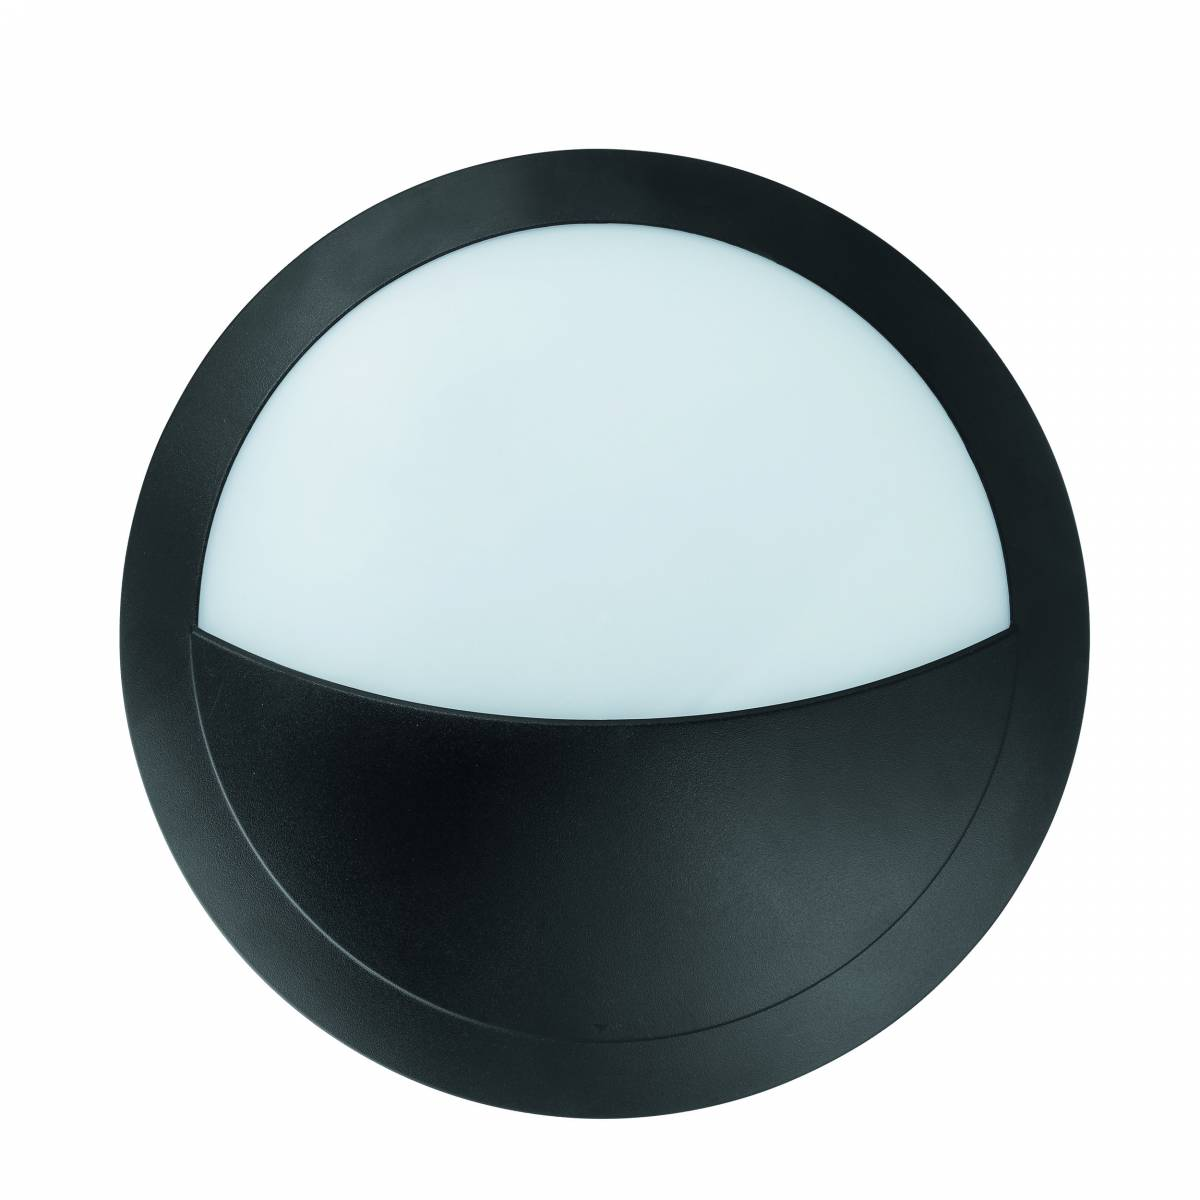 Bellaria wall-mounted luminaire round 6W 4000K black IP66